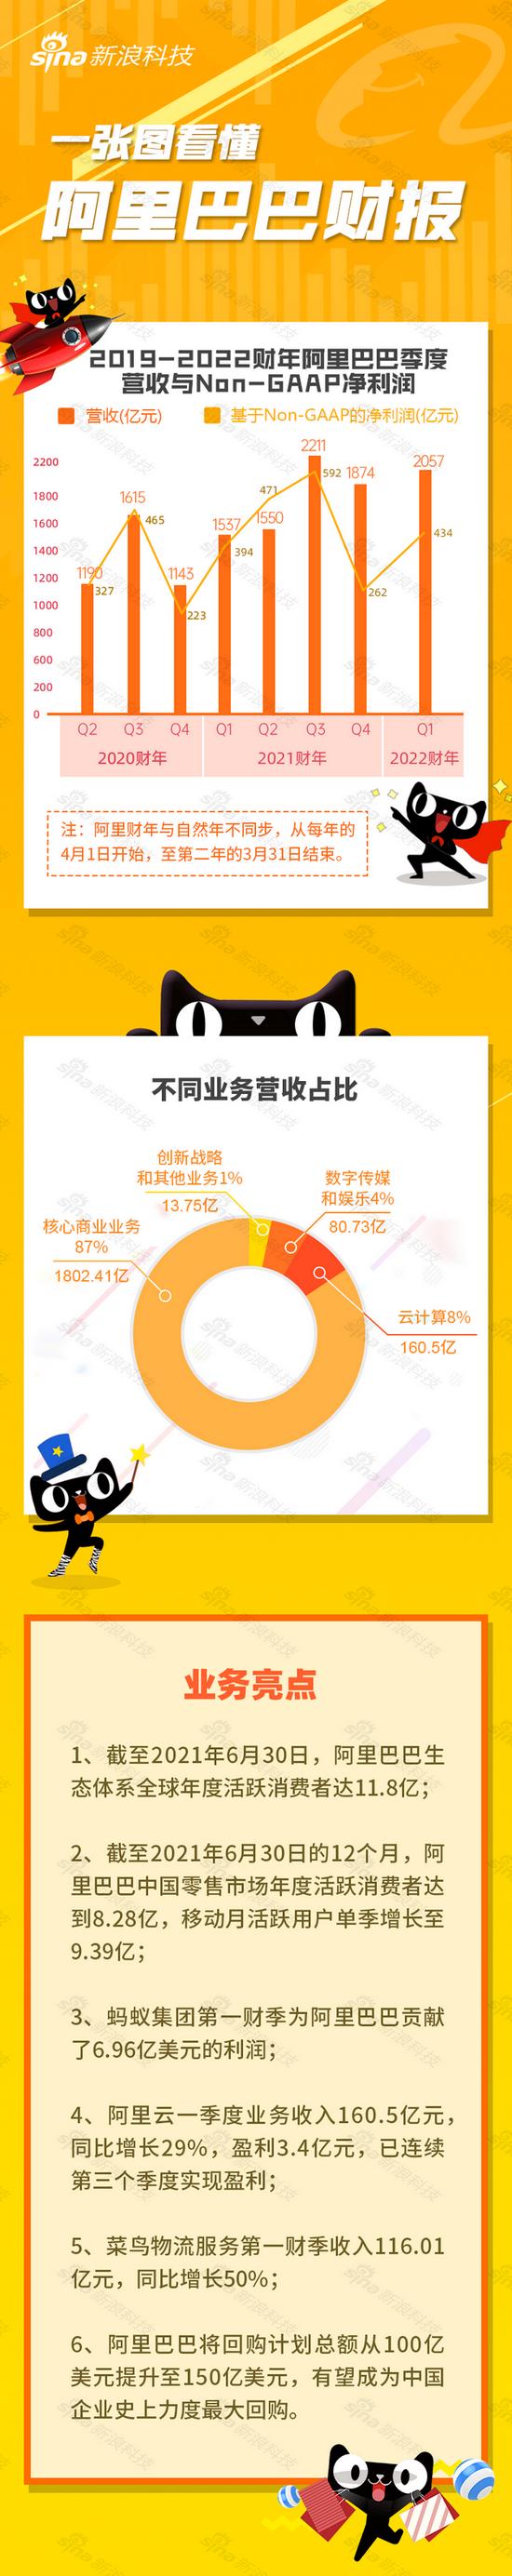 https://n.sinaimg.cn/tech/transform/119/w550h2769/20210803/6998-c9490d09b57e18132a13895ae862629a.png